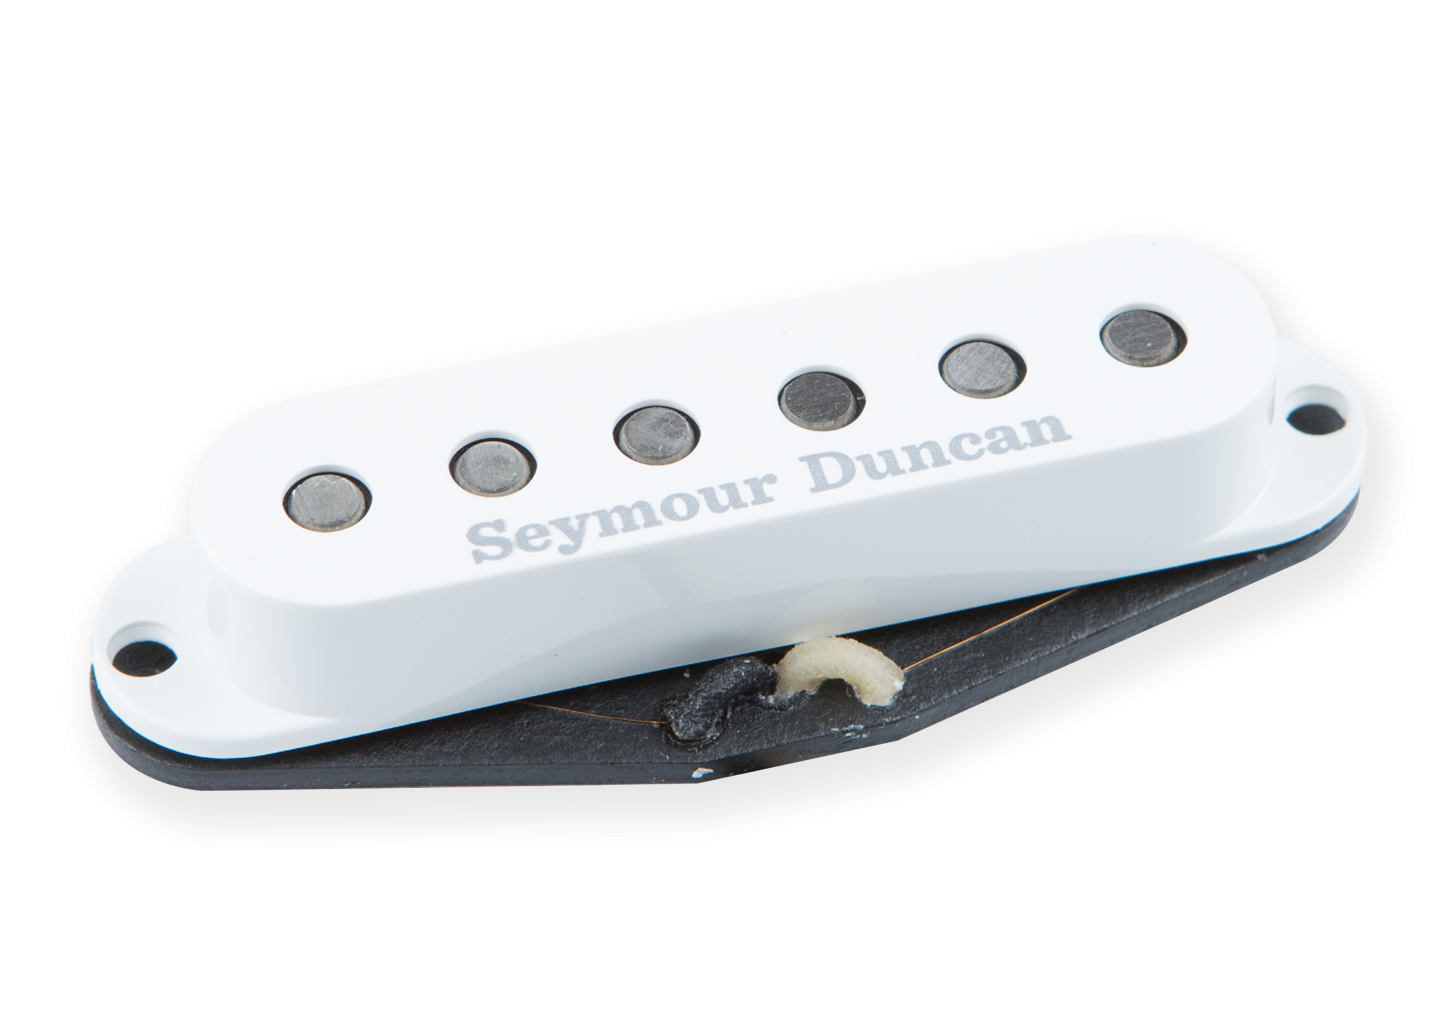 Seymour Duncan Vintage Flat Strat SSL-2 RW/RP Middle